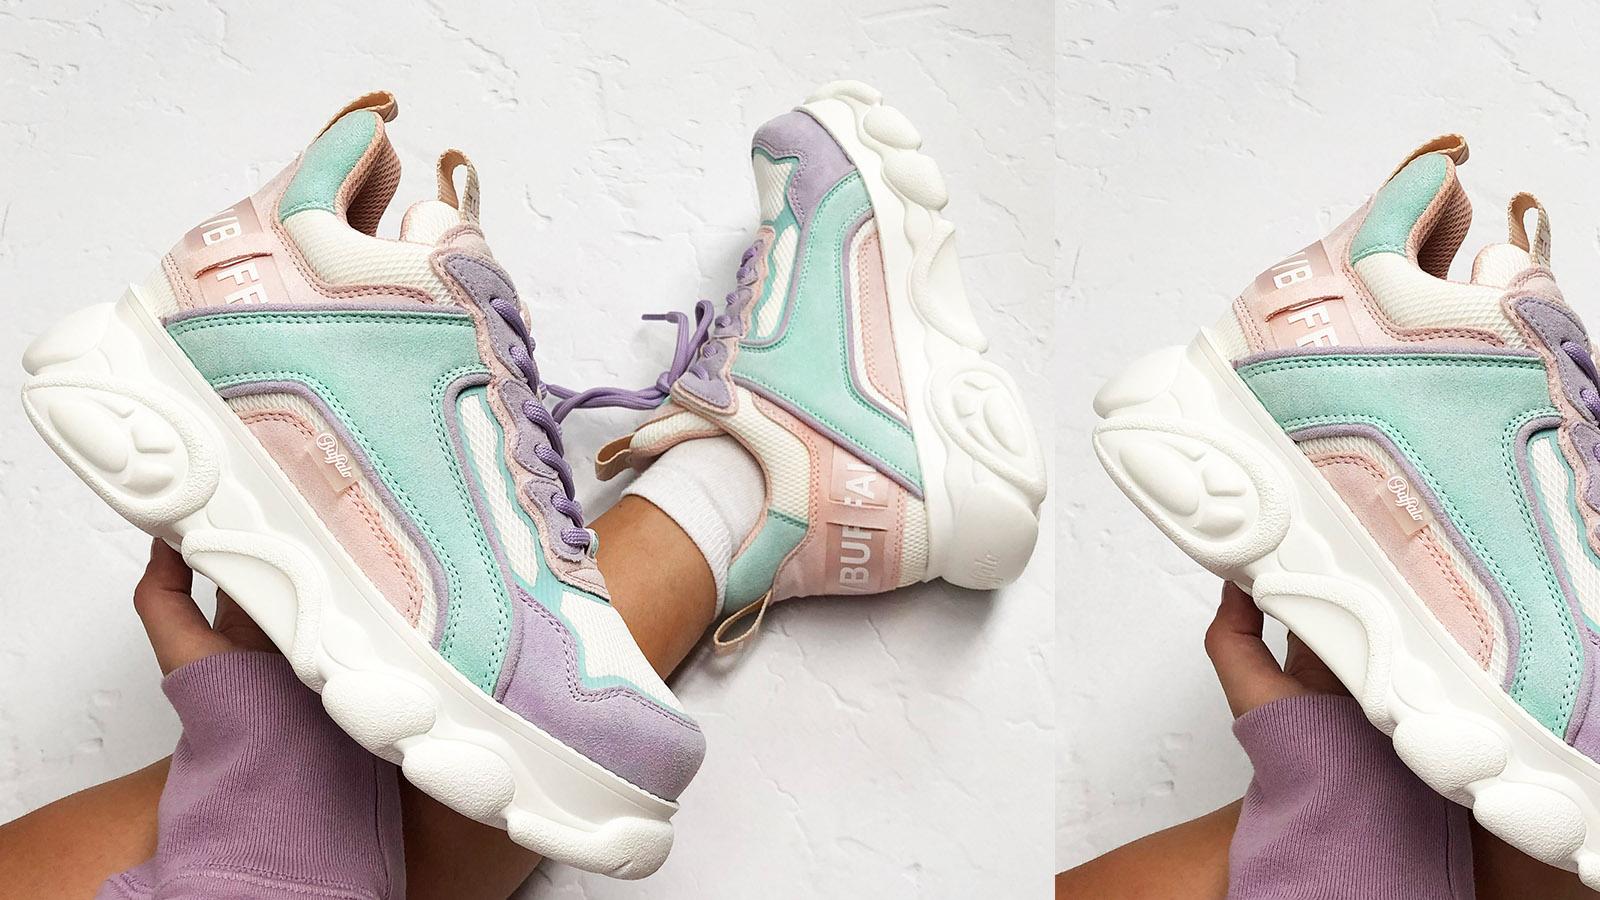 veja shoes asos Shop Clothing \u0026 Shoes